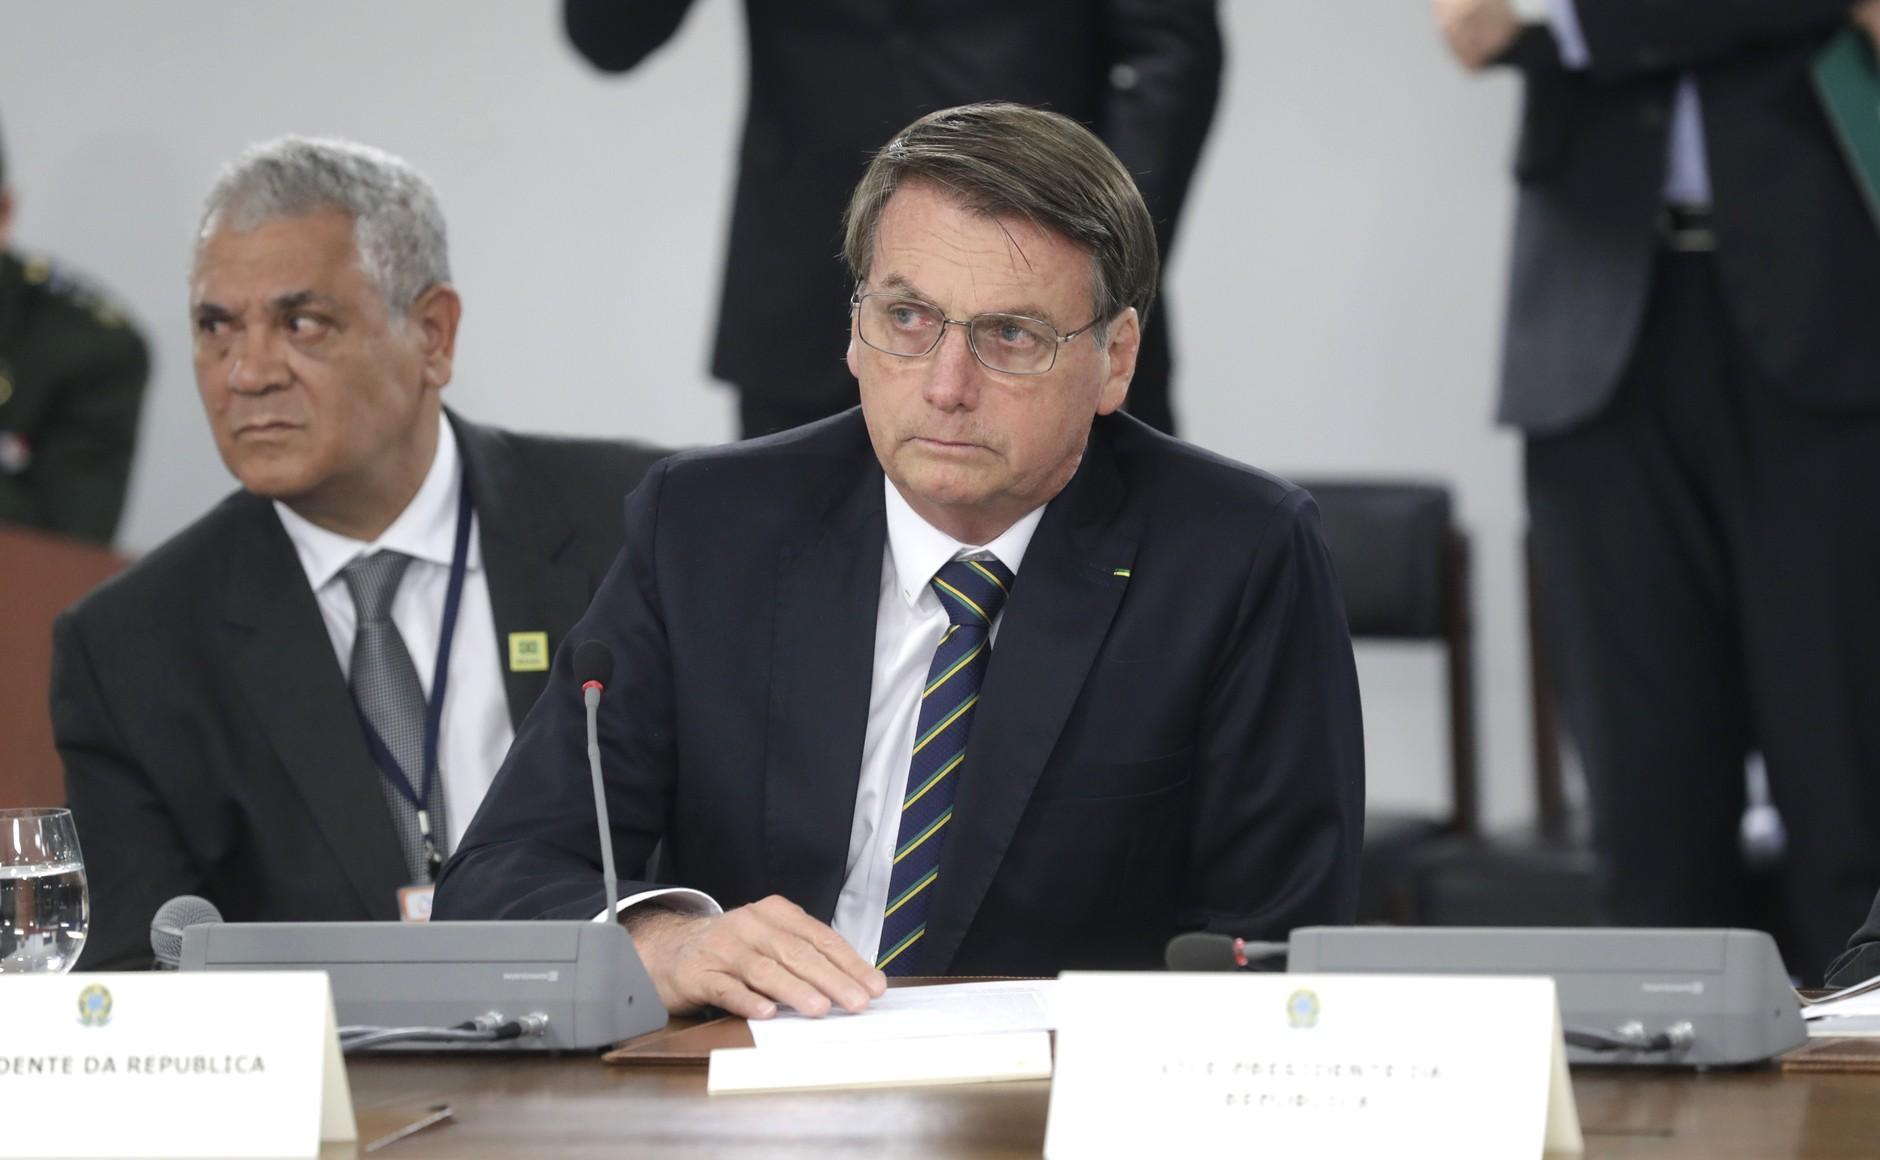 <p>Президент Бразилии Жаир Болсонару. Фото © Kremlin</p>